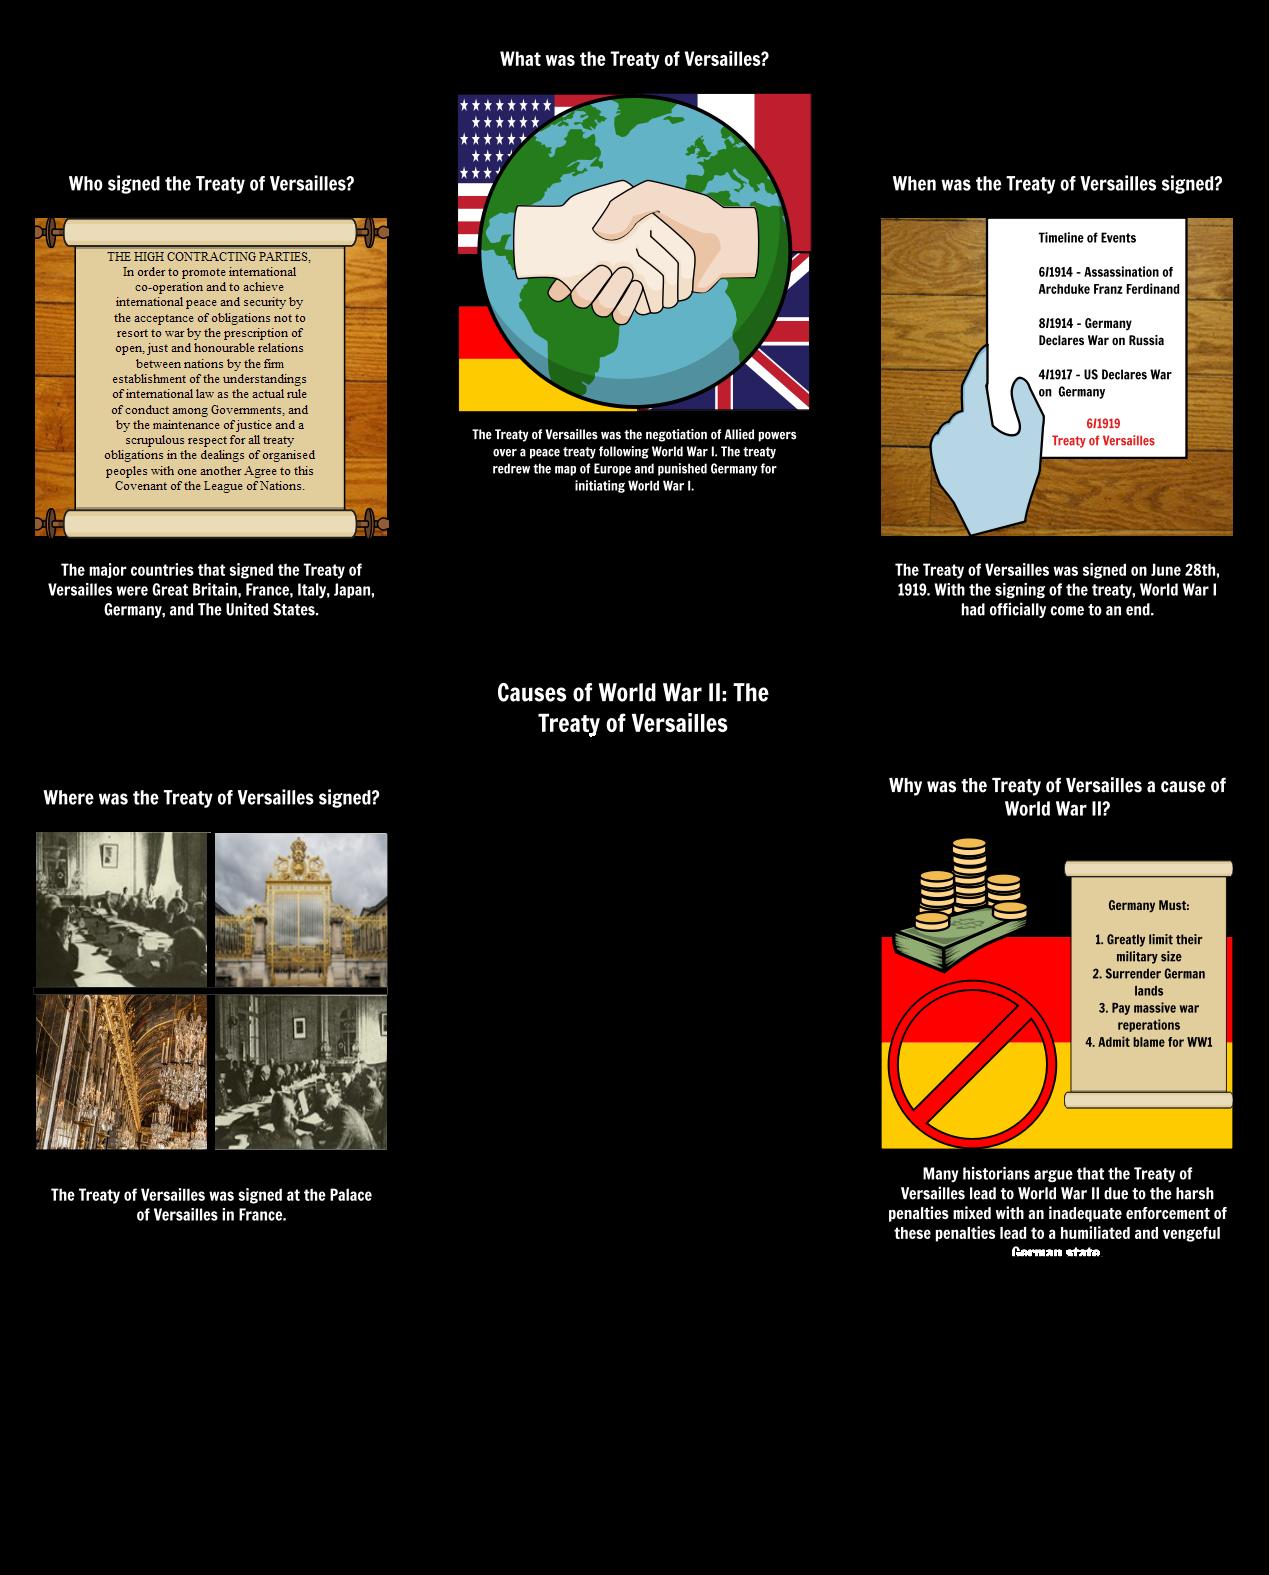 5 causes of world war 2